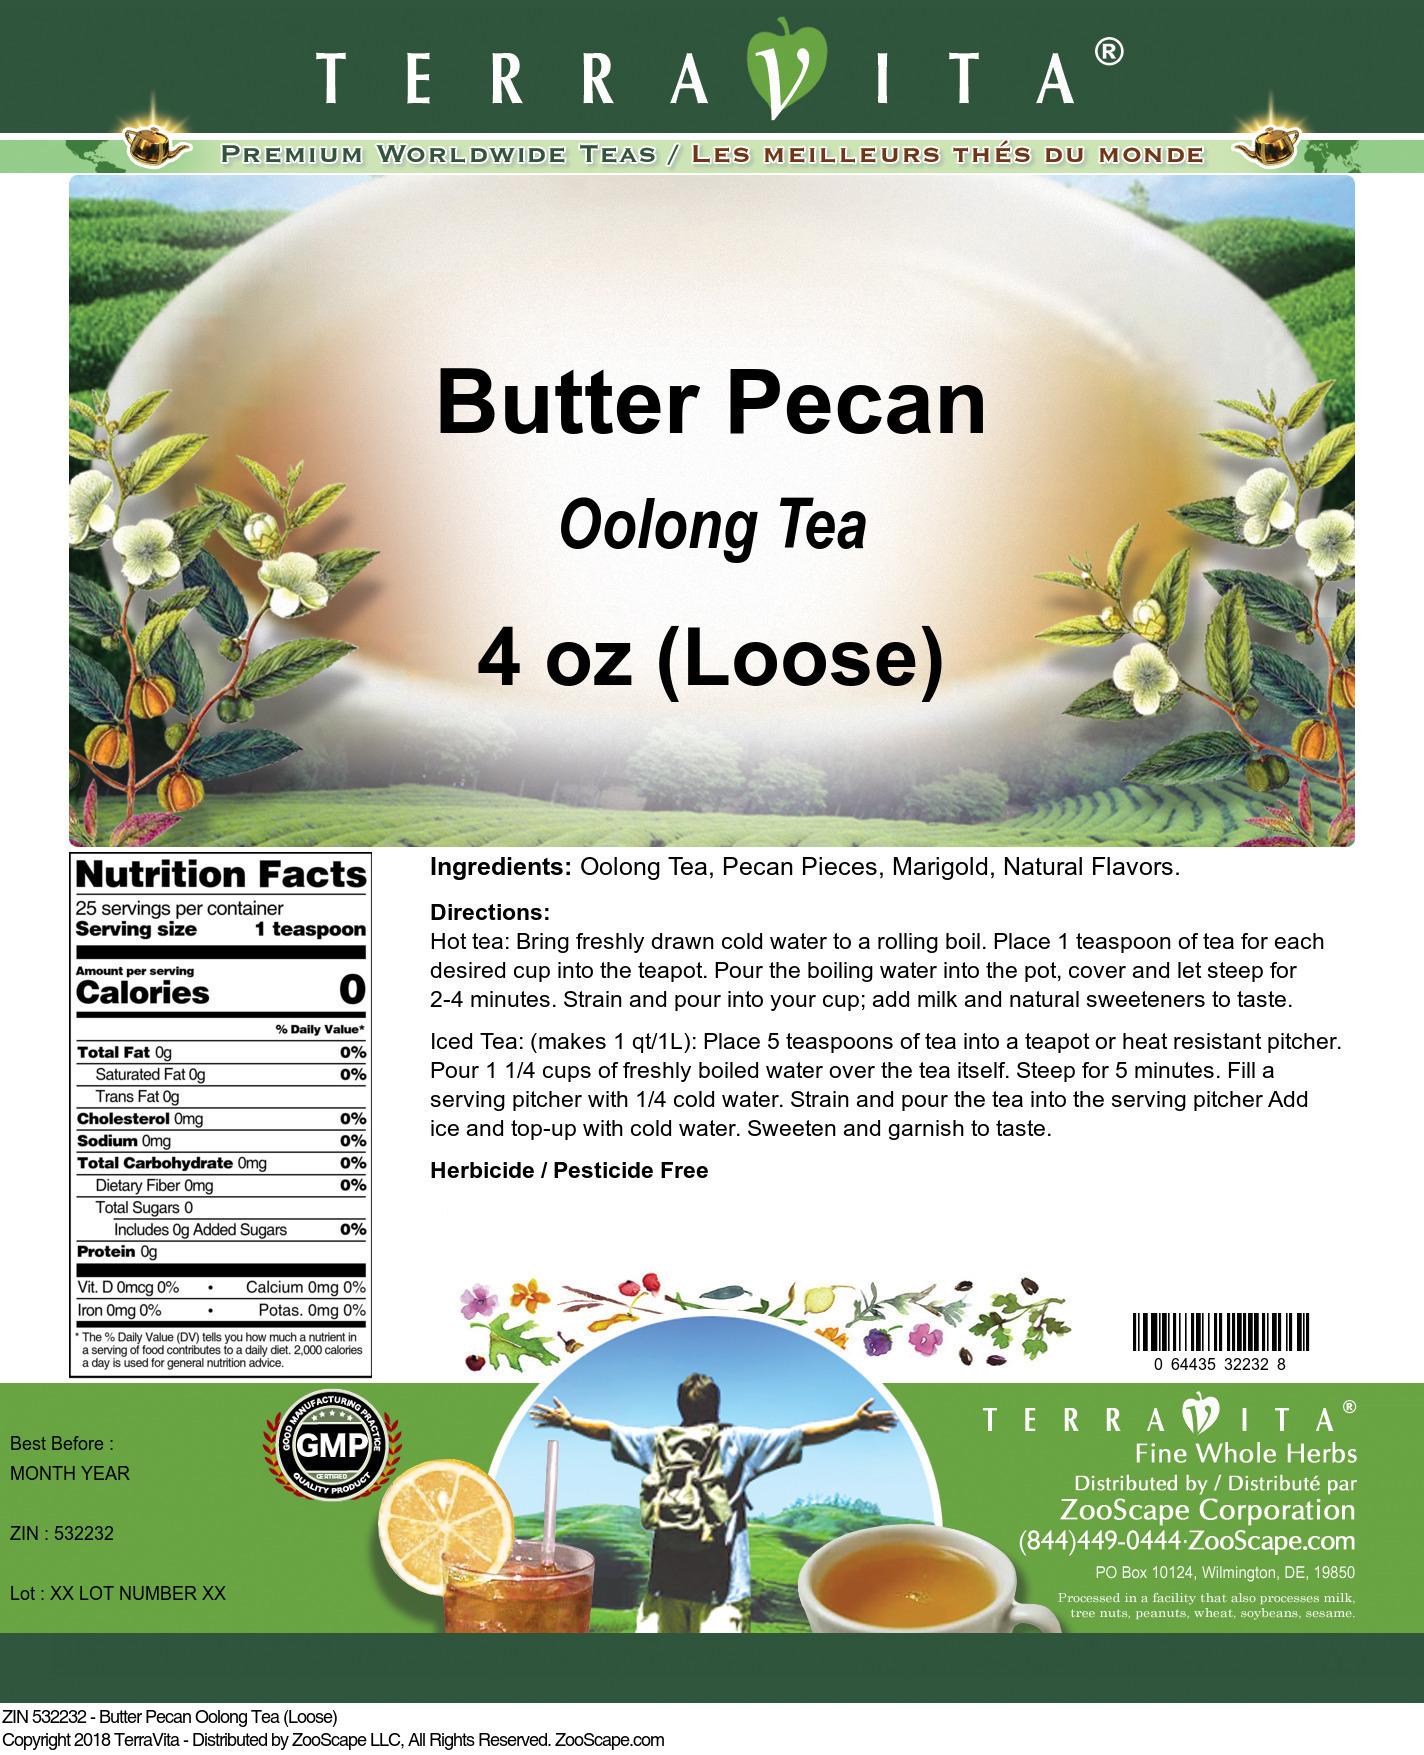 Butter Pecan Oolong Tea